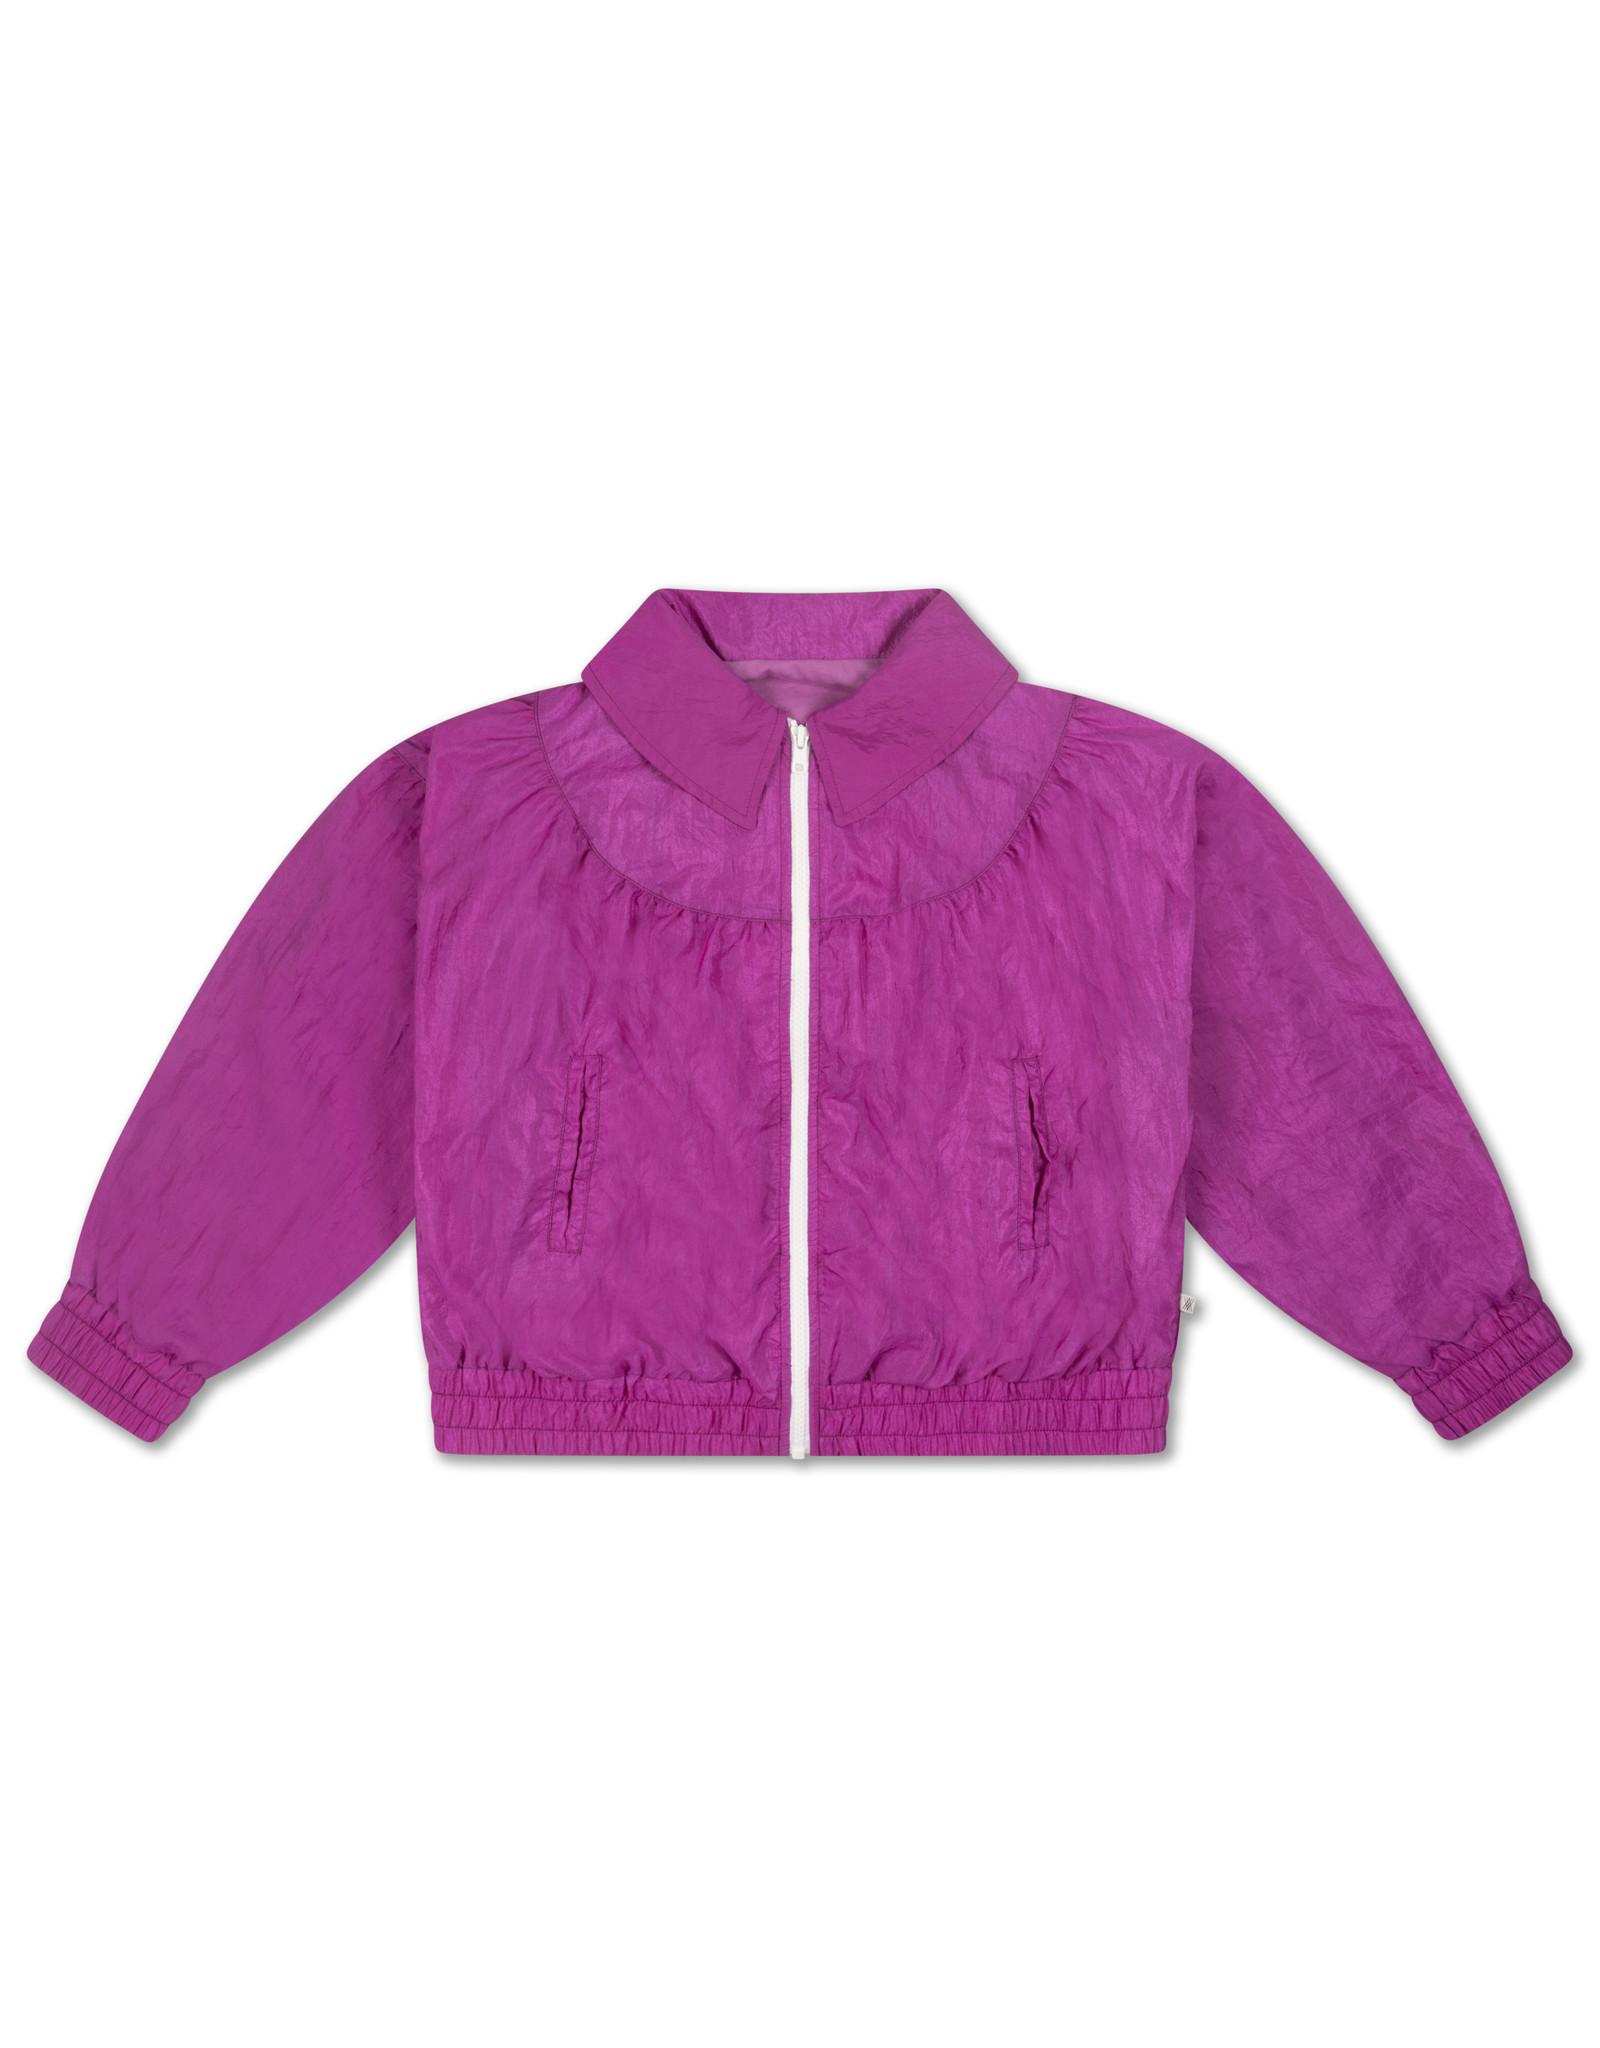 Repose Repose SS21 42 Sporty jacket fuchsia